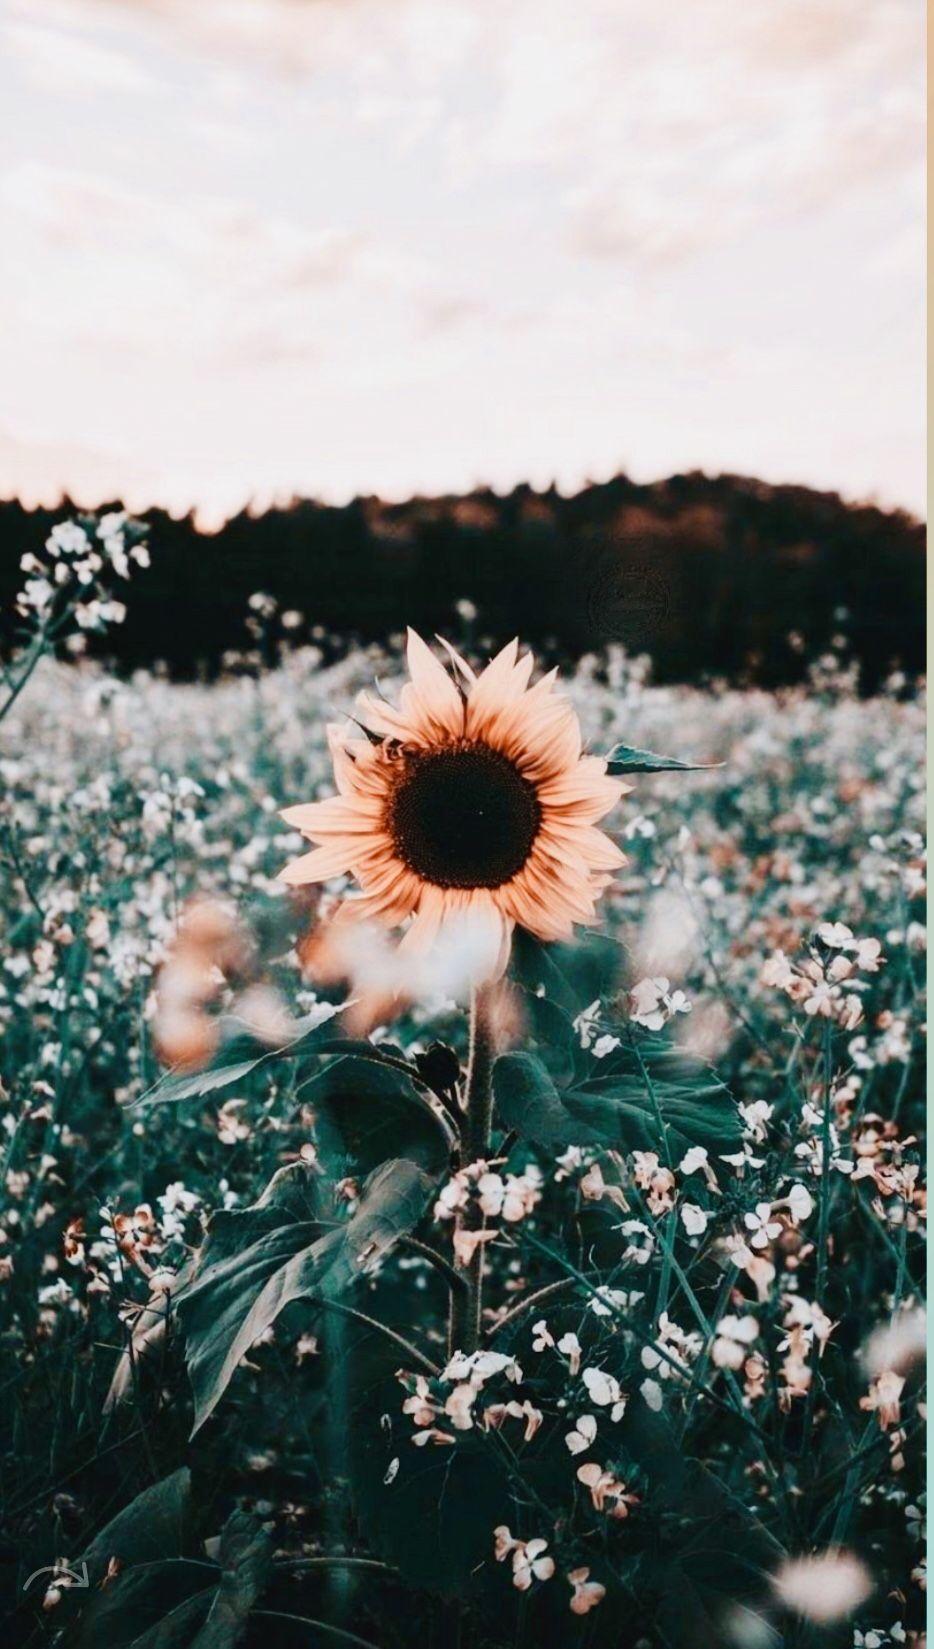 Flower Iphone Wallpaper Tumblr